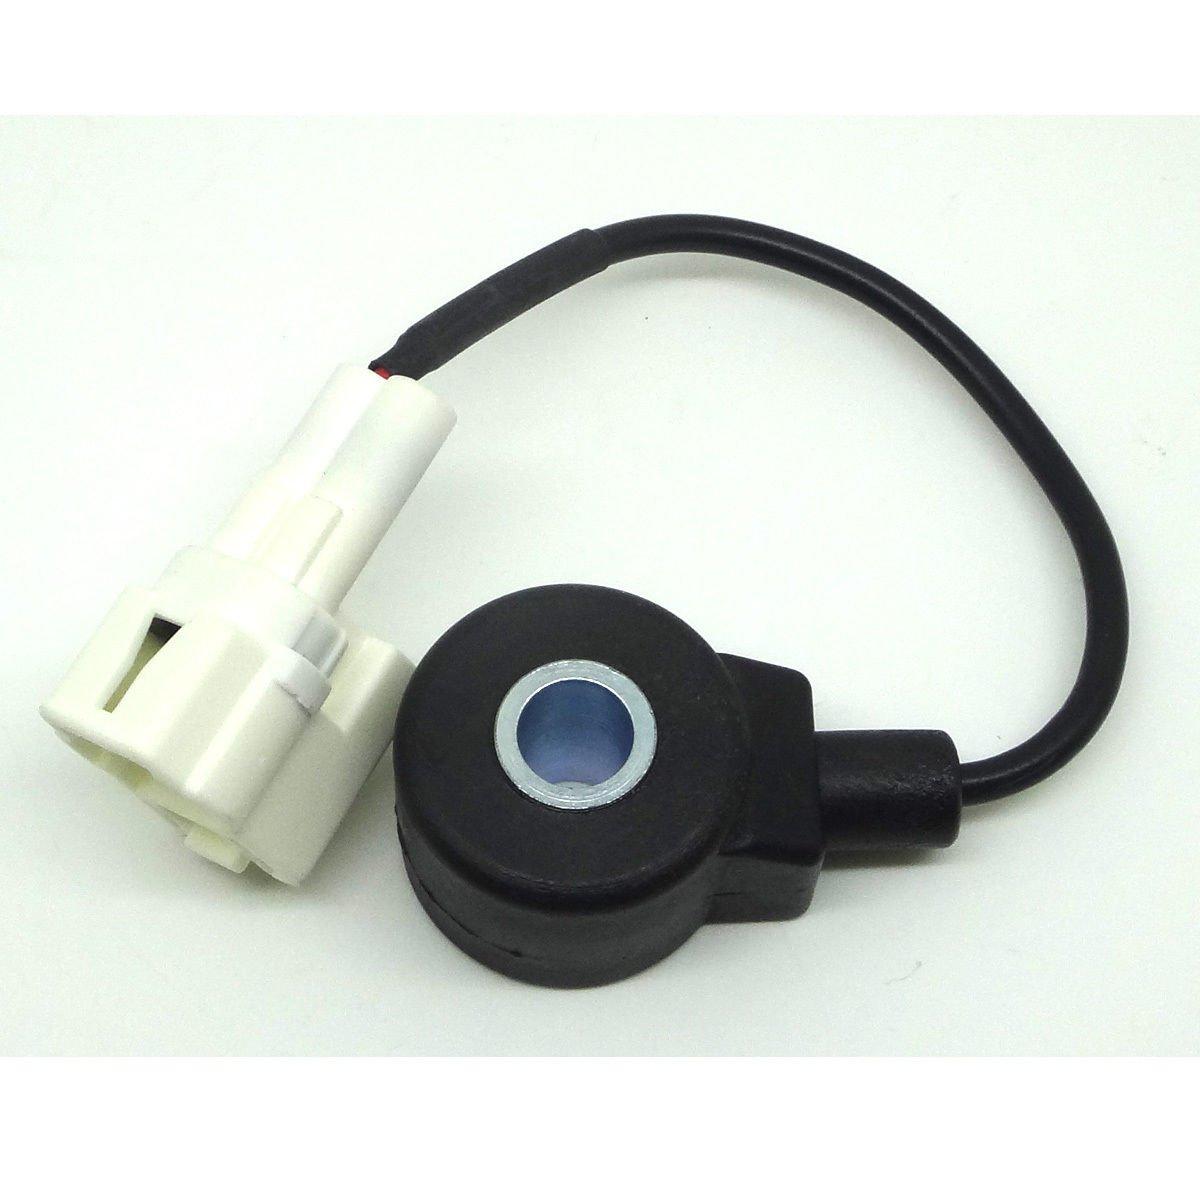 Knock Sensor For Subaru Forester Impreza Legacy 2.2L 2.5L 22060-Aa061 22060Aa061 1998-1999 Subaru Legacy 2.5 H4 Ks-Sb-Aa061,22060Aa061, 22060-Aa061, 213-1826, 5S2295, 71-6669 Yihao